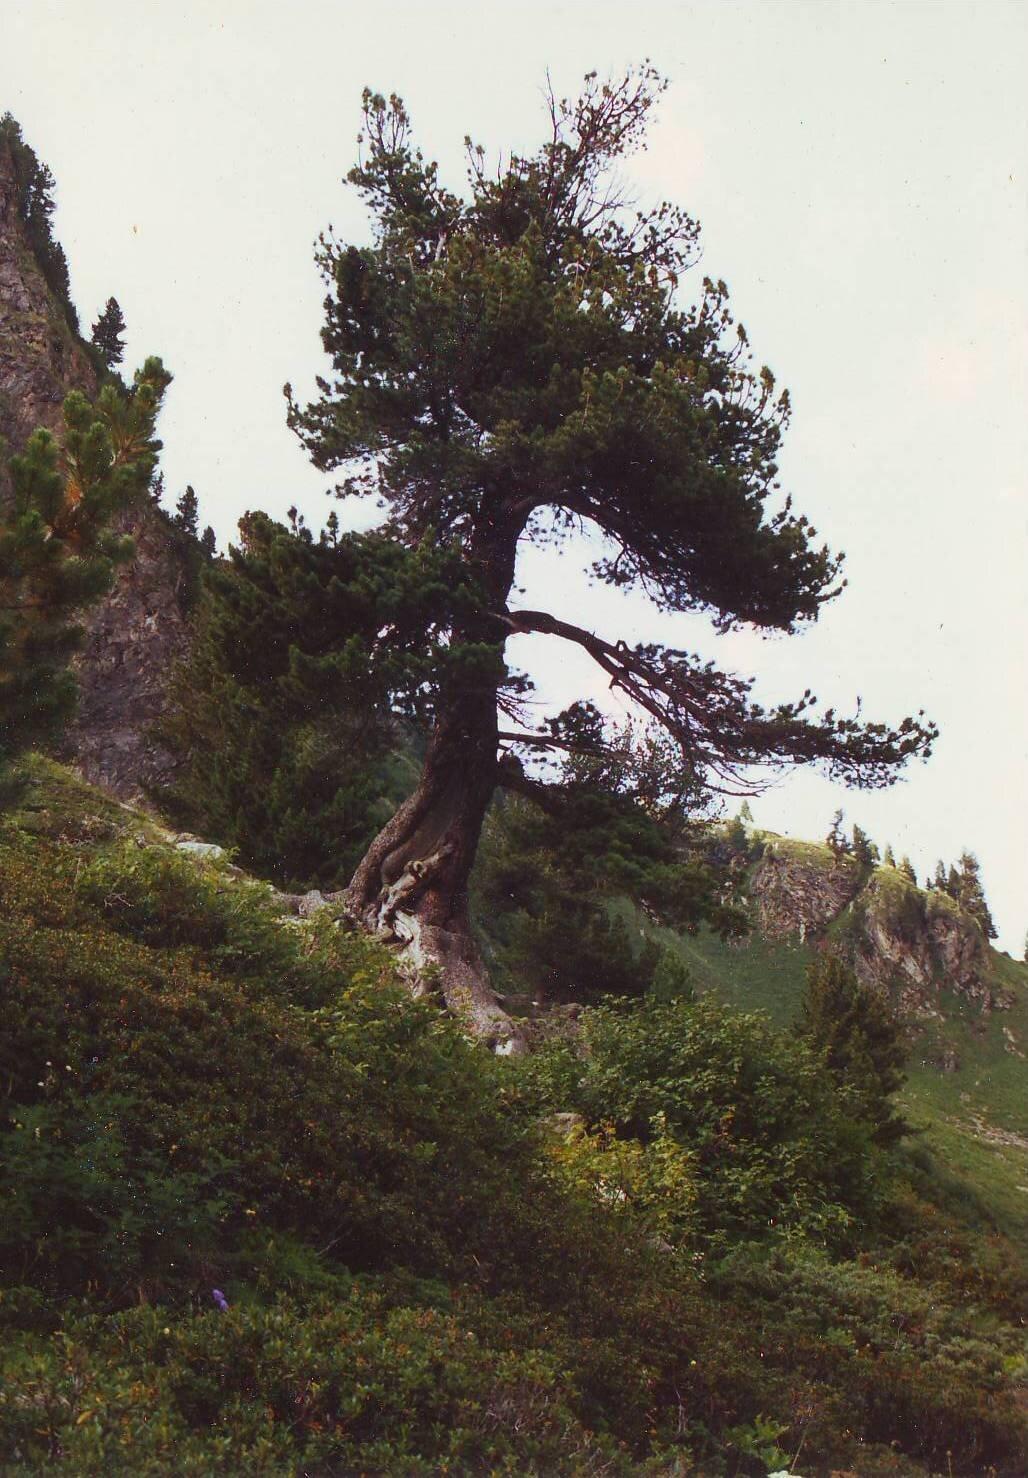 Eine stolze Arve an den steilen Berghängen der Schweiz.